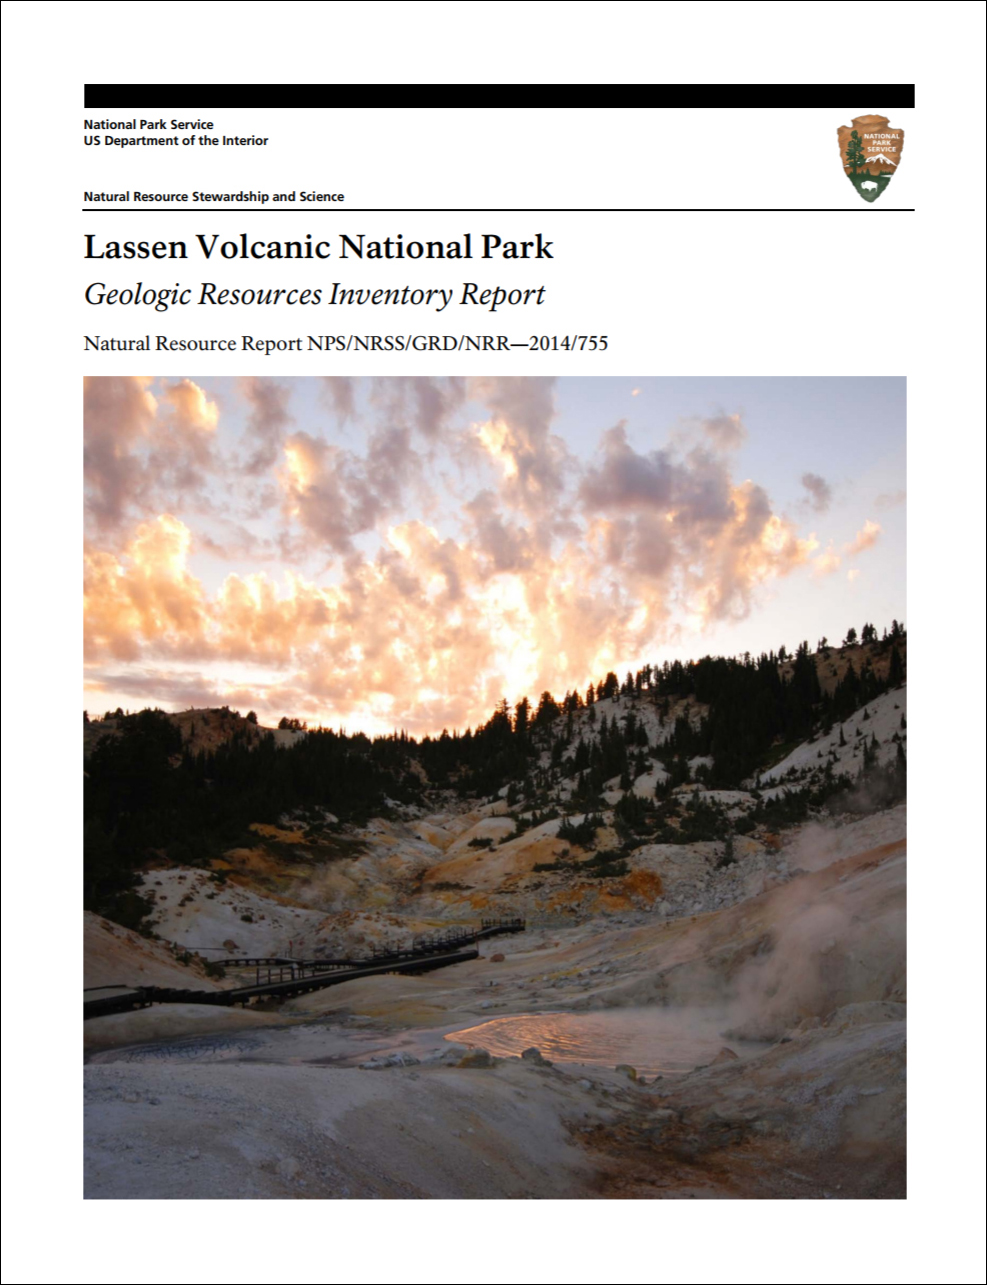 Nps Geodiversity Atlaslassen Volcanic National Park California Cinder Cone Volcano Cones Shield Us Service